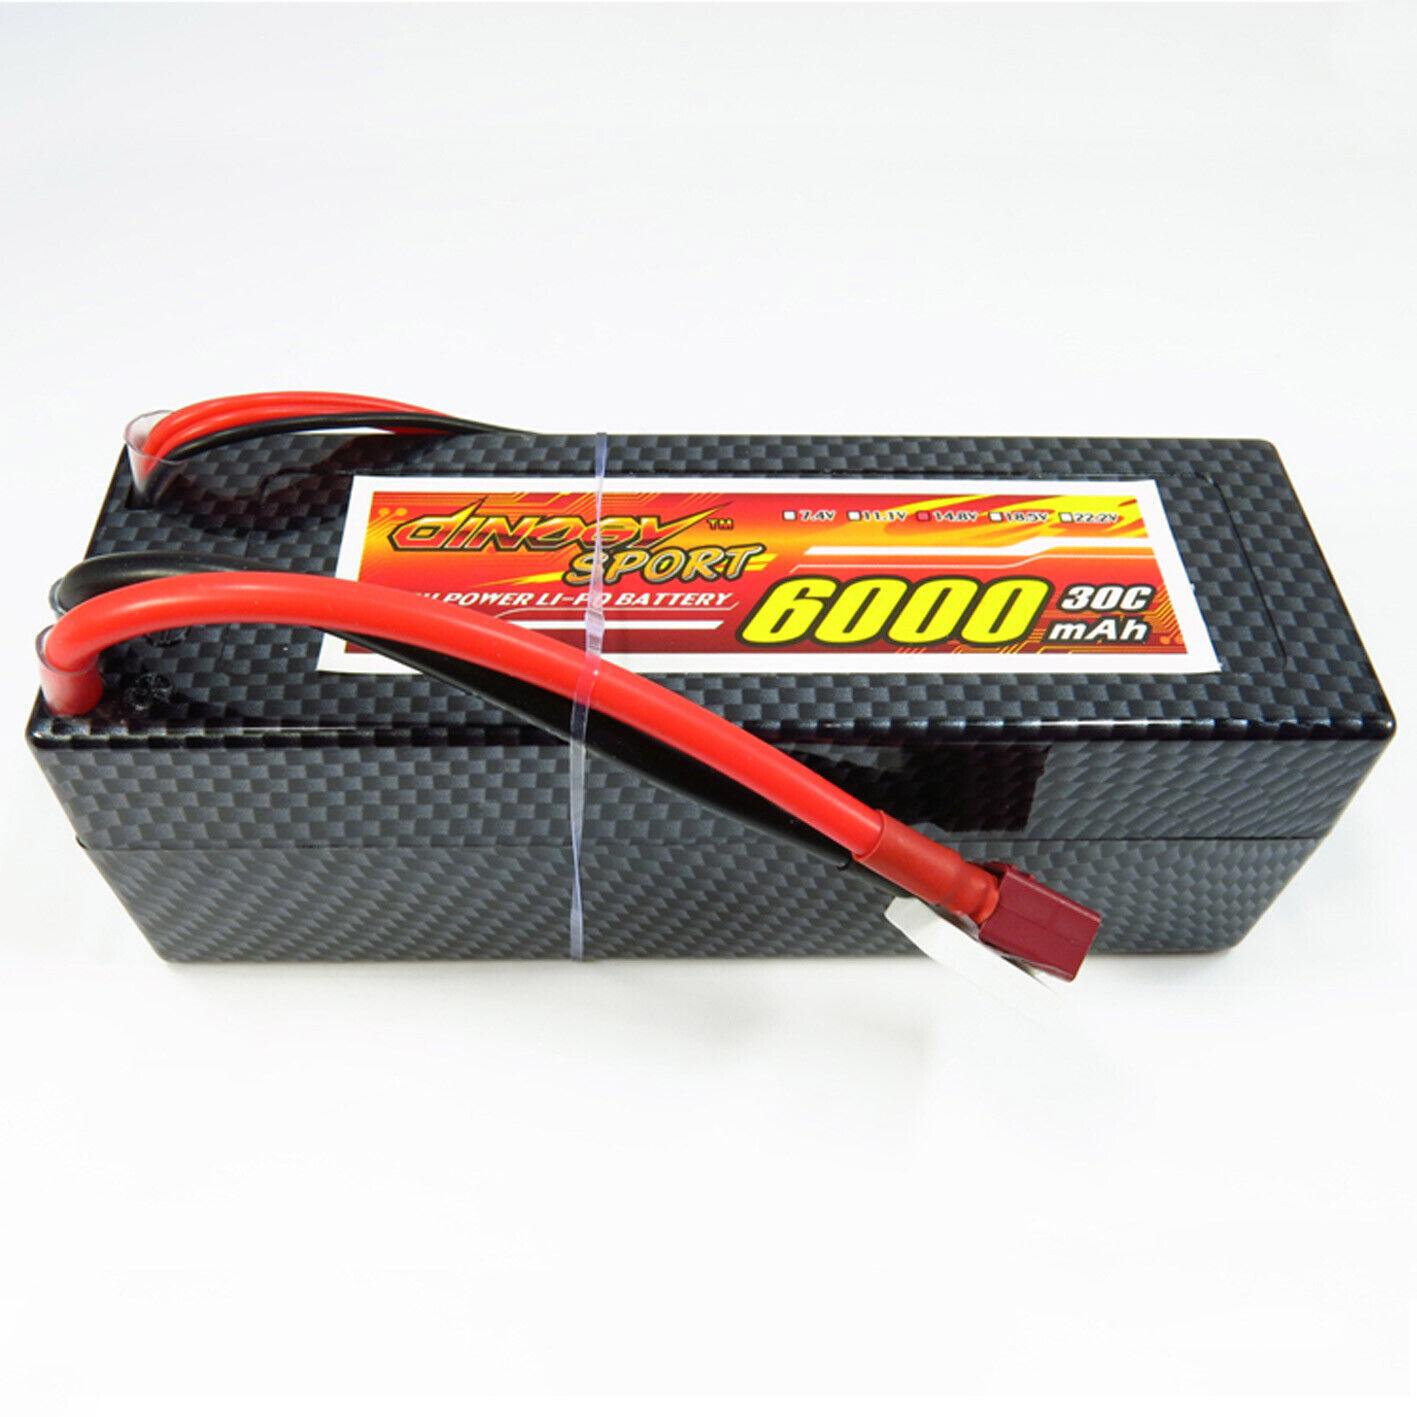 14 8V 4S 6000mAh 30C T plug LiPO Battery Hardcase for RC Buggy Car